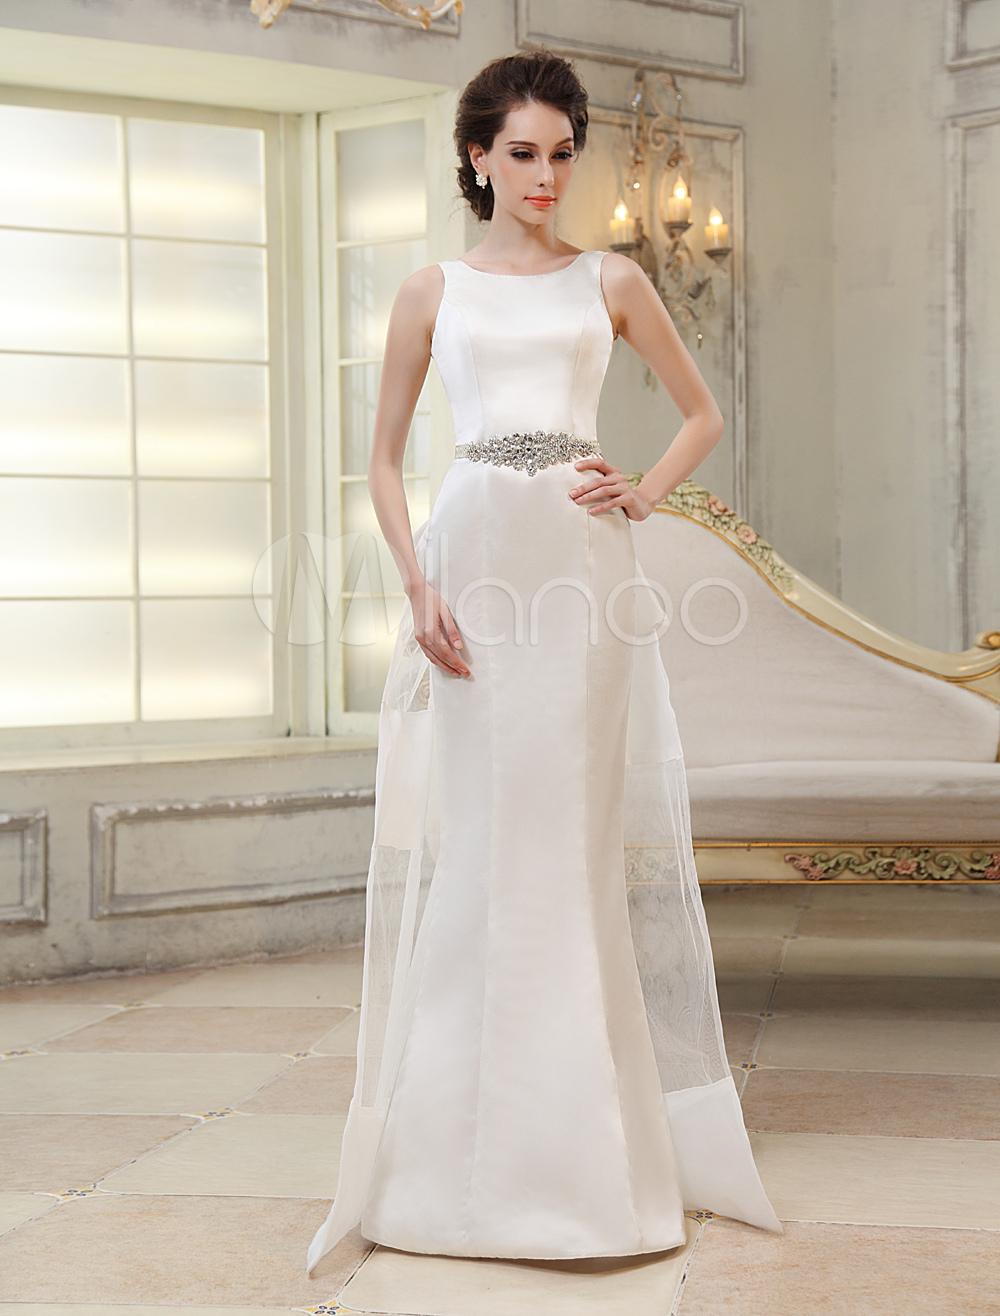 Sweep Ivory Jewel Neck Sheath Bridal Wedding Gown with Bow  Milanoo